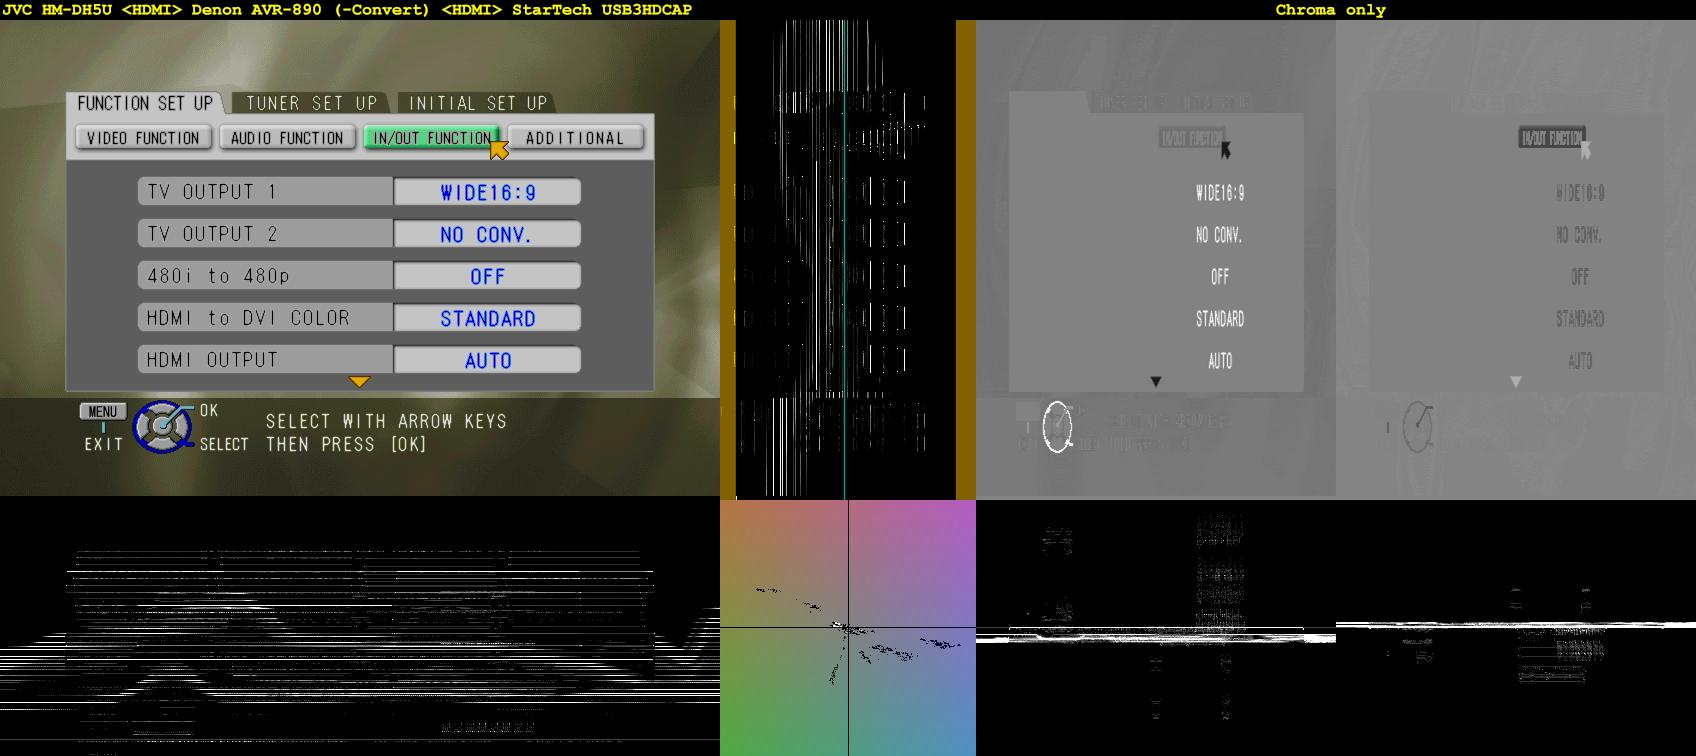 Click image for larger version  Name:Menu - JVC HM-DH5U =HDMI= Denon AVR-890, -Convert =HDMI= StarTech USB3HDCAP.png Views:3770 Size:396.3 KB ID:35268